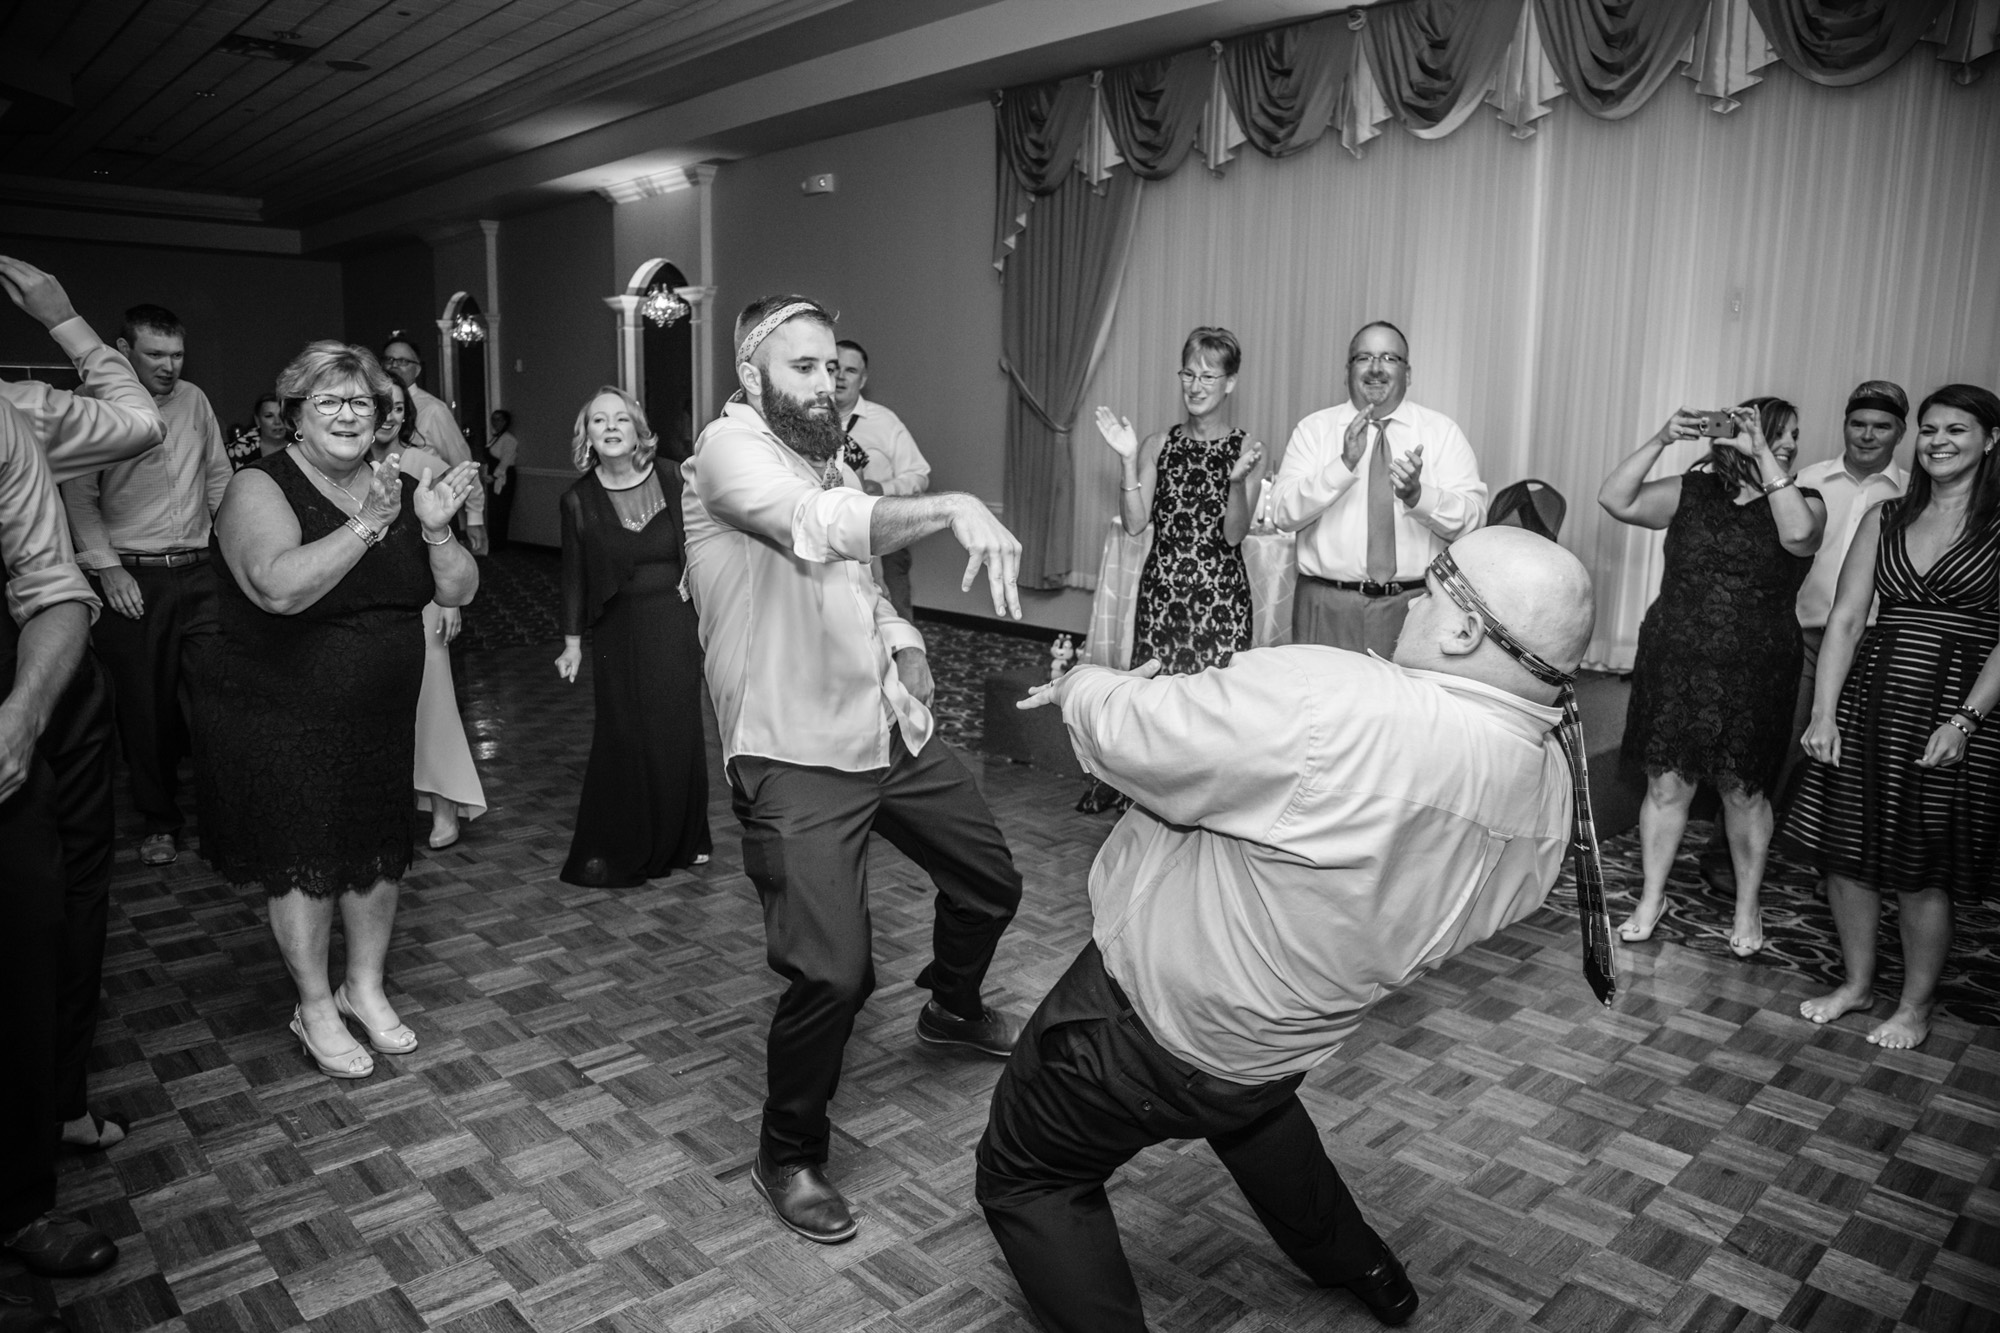 scranton_wedding_photographer_lettieri_pa (40 of 47).jpg